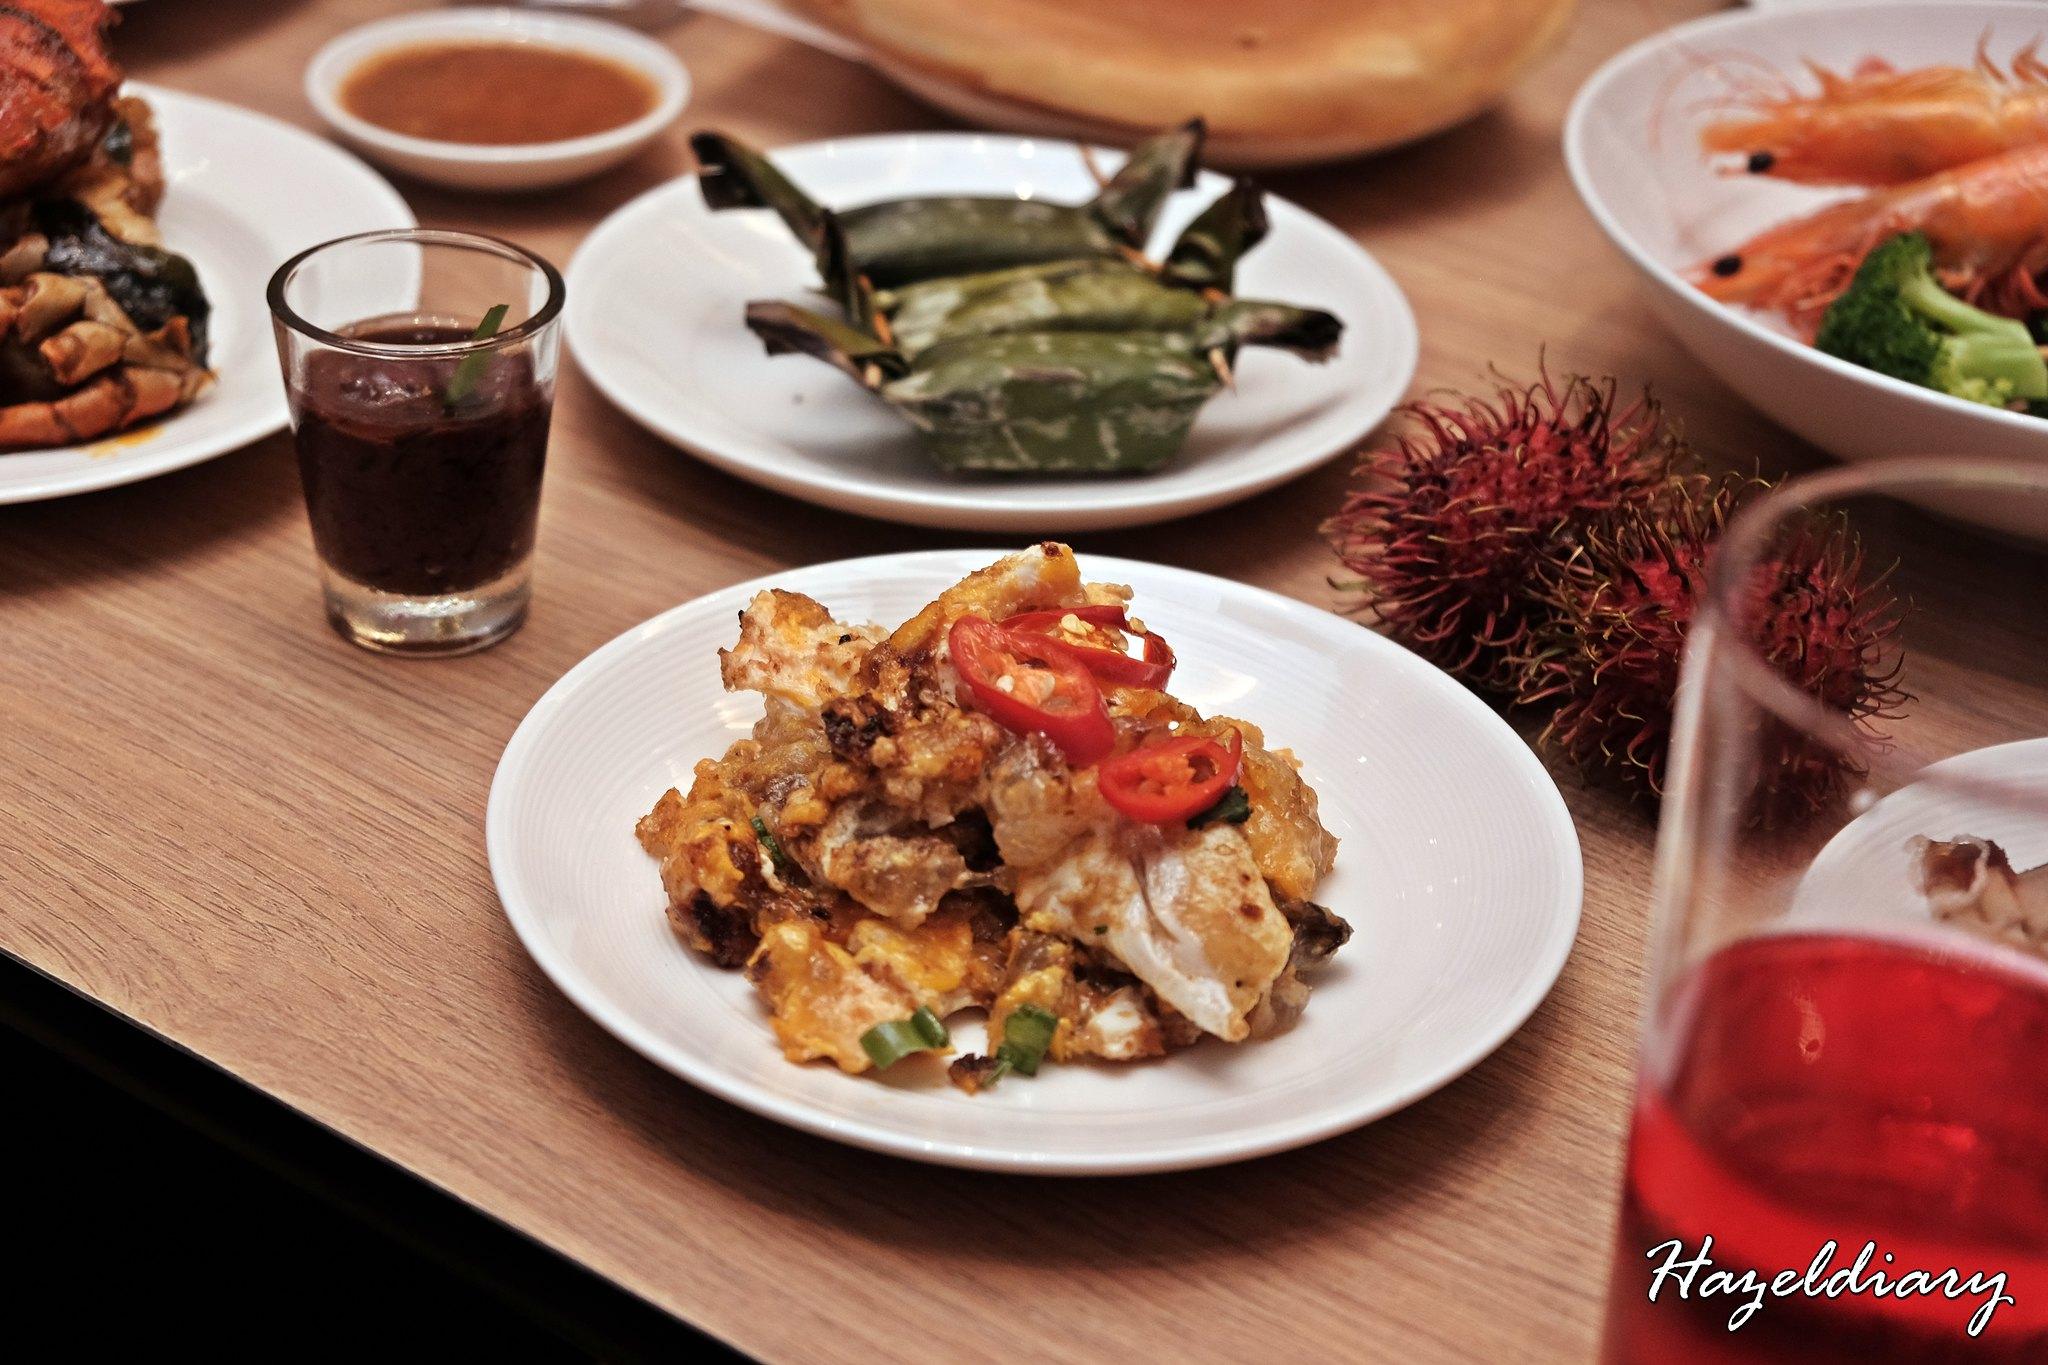 Penang Food Fare Buffet-Sky22 Courtyard Marriott-Oyster Omelette